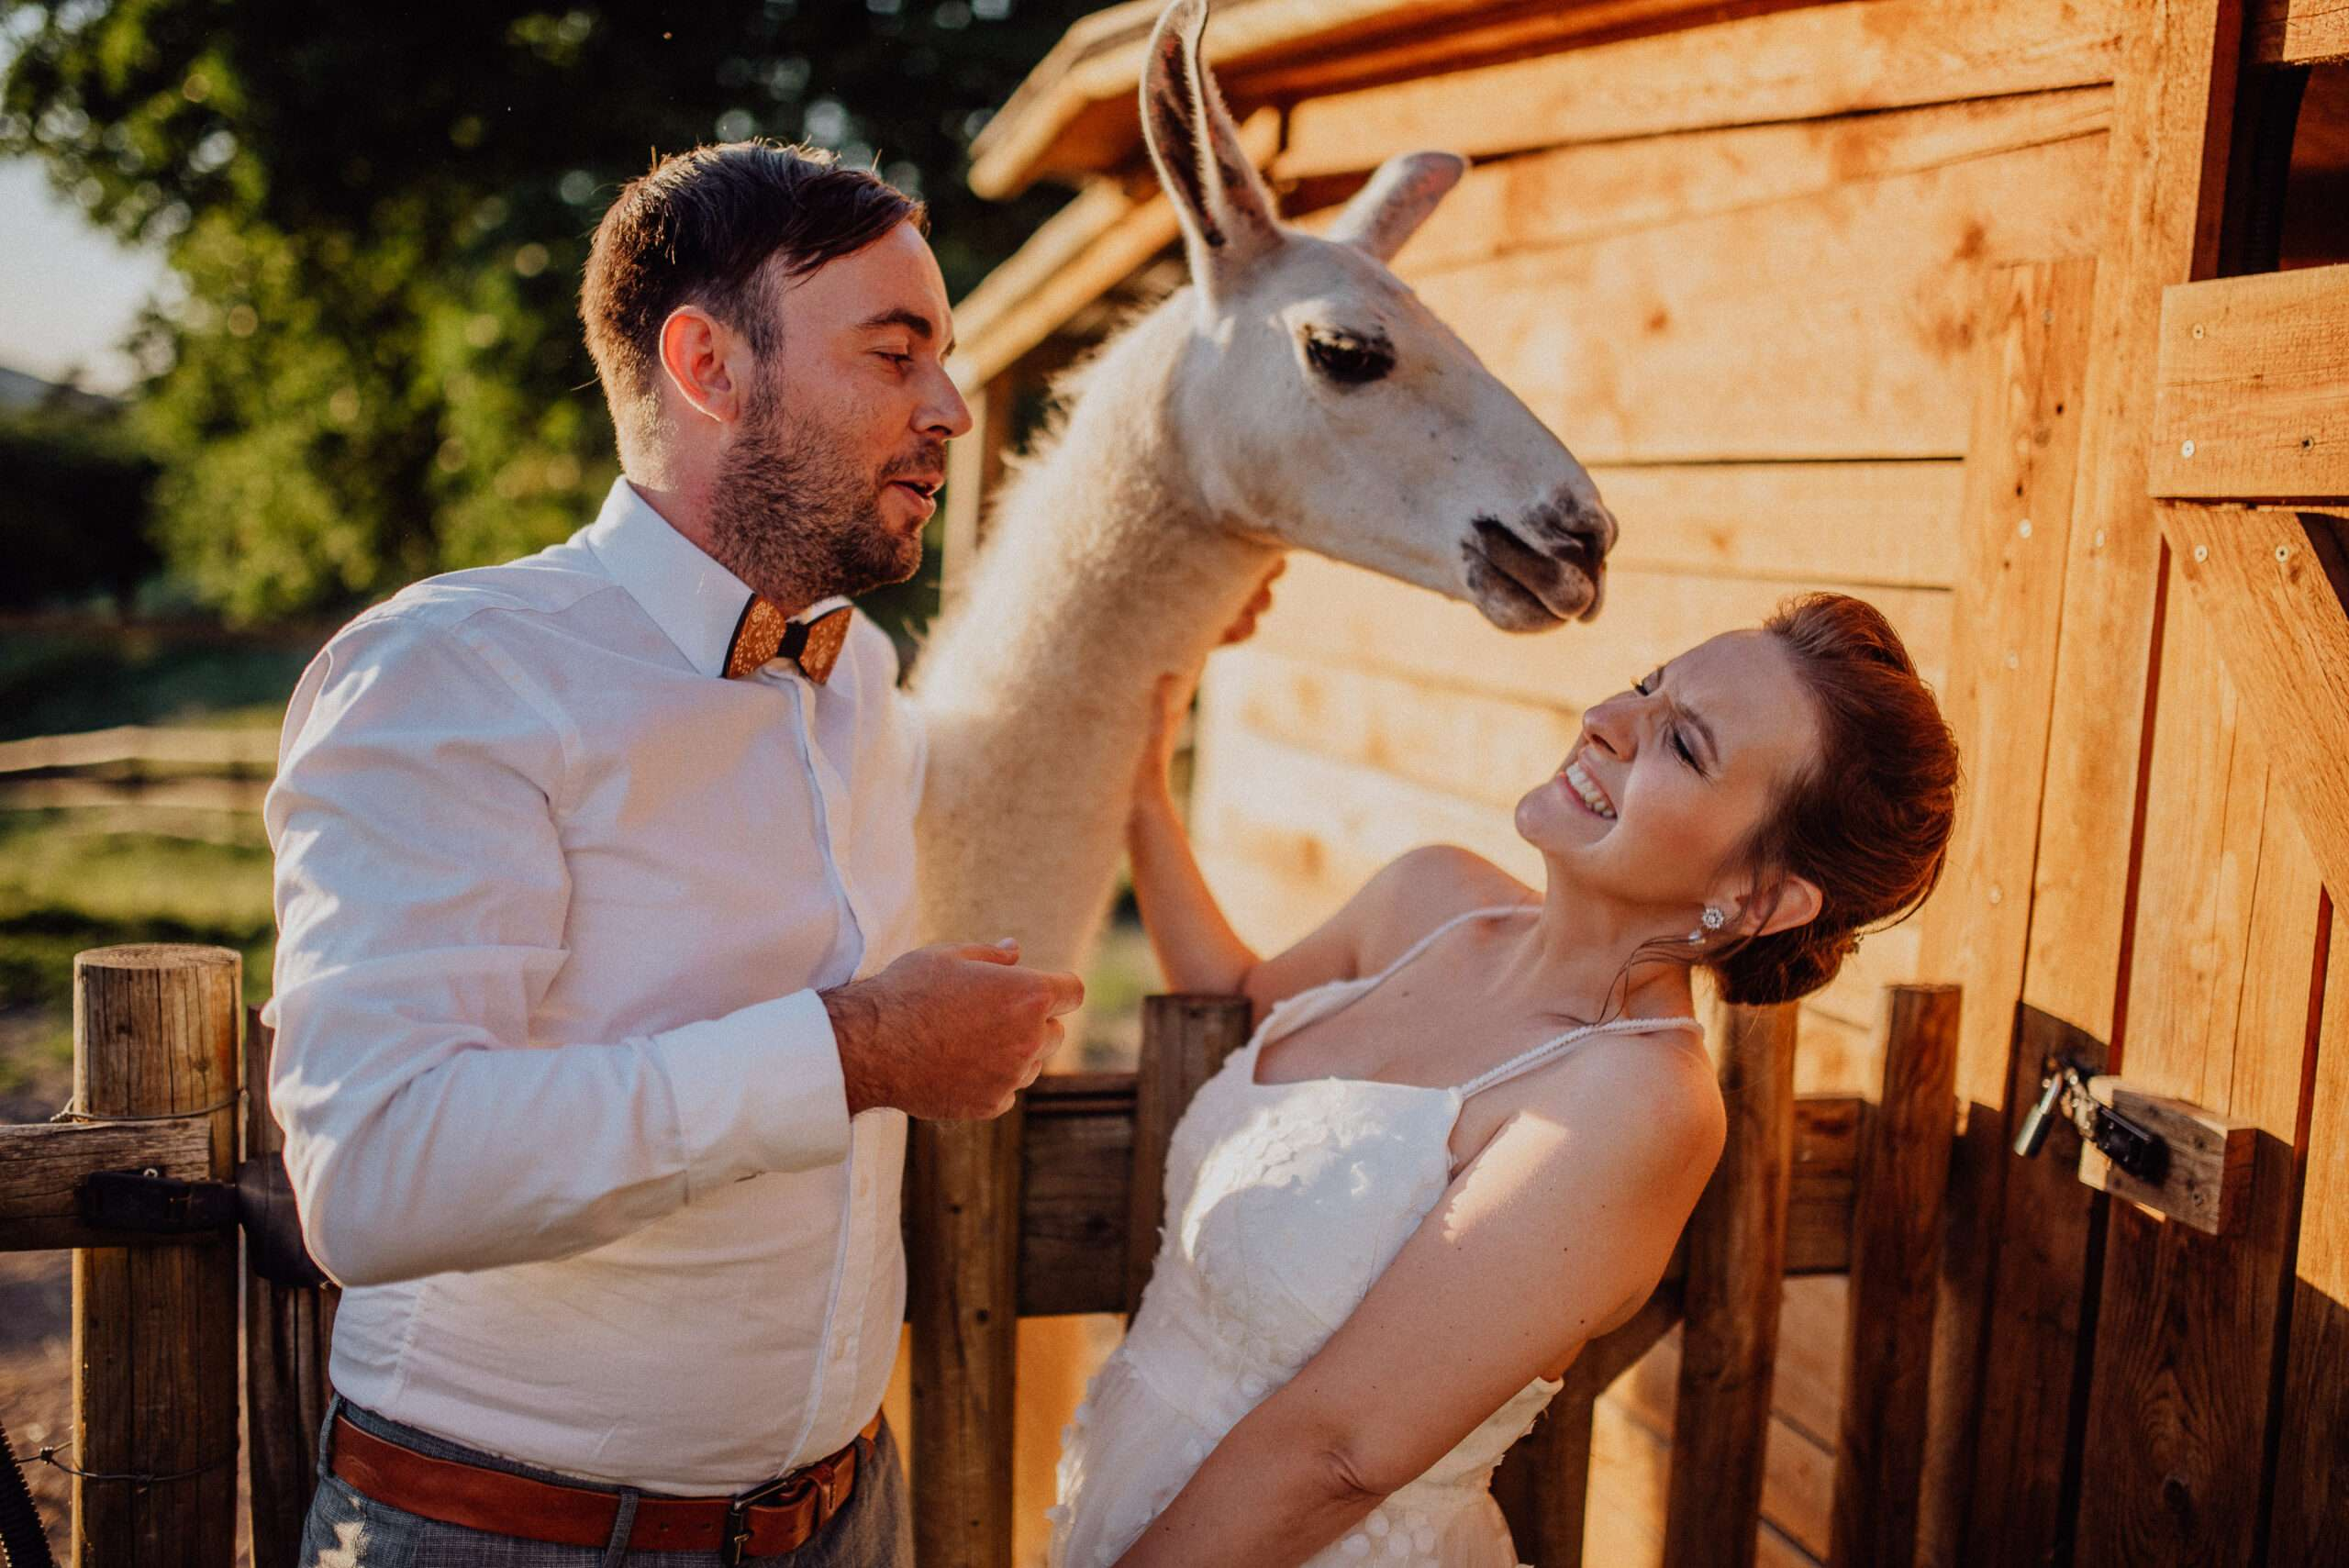 Novomanželé se fotí s lamou Statek Samsara Blansko